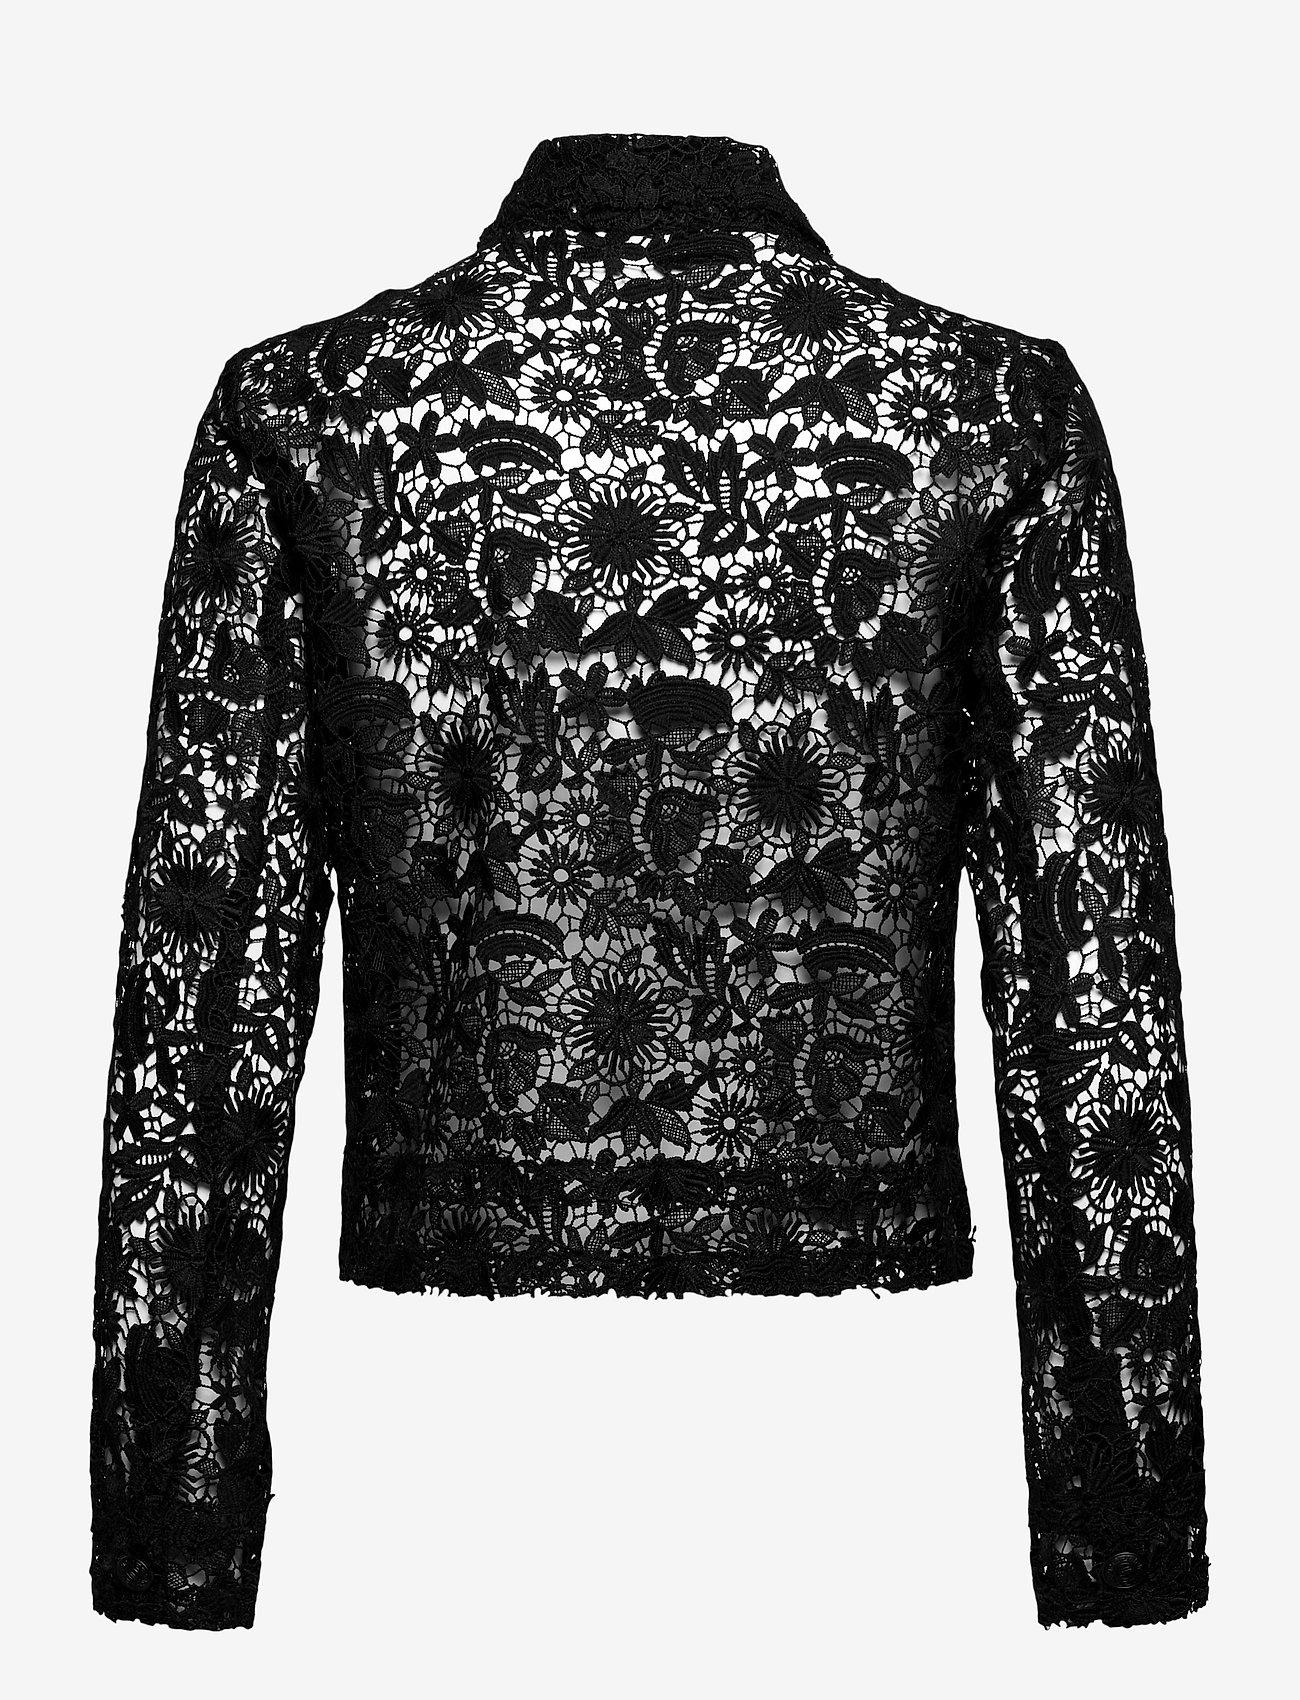 SAND - 3180 - Kaela - overhemden met lange mouwen - black - 1